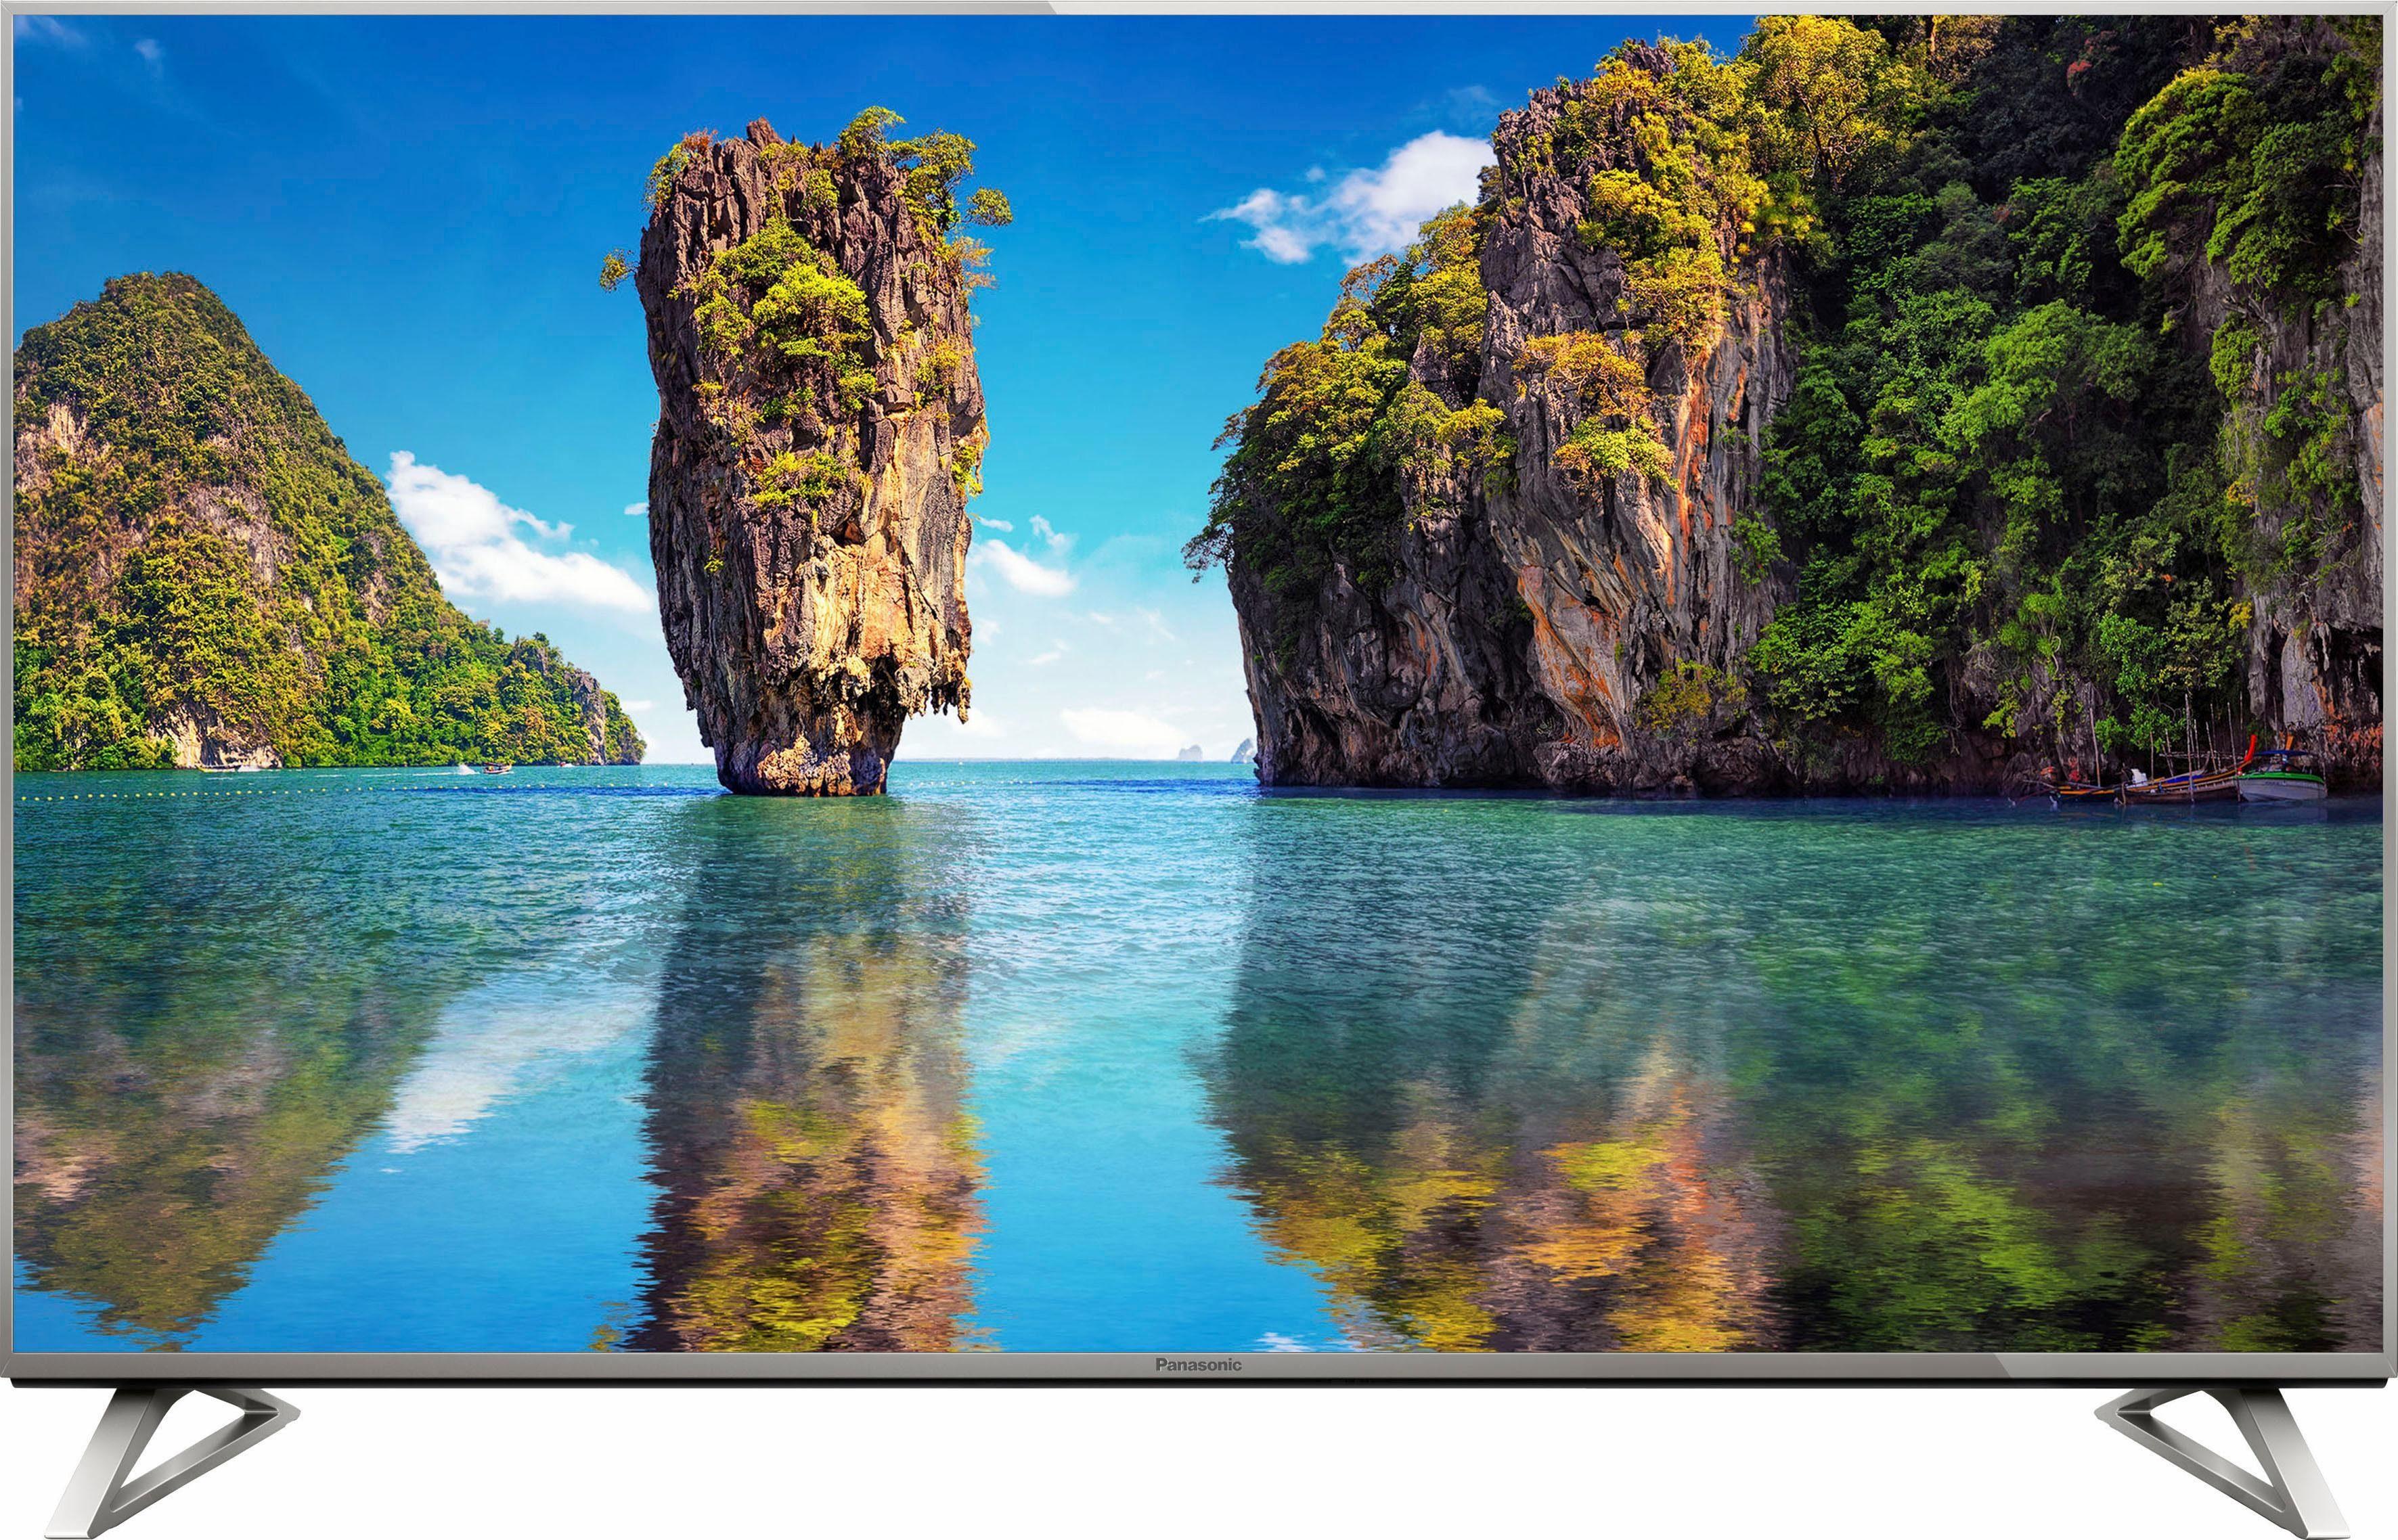 Panasonic TX-58DXW704, LED Fernseher, 146 cm (58 Zoll), 2160p (4K Ultra HD), Smart-TV